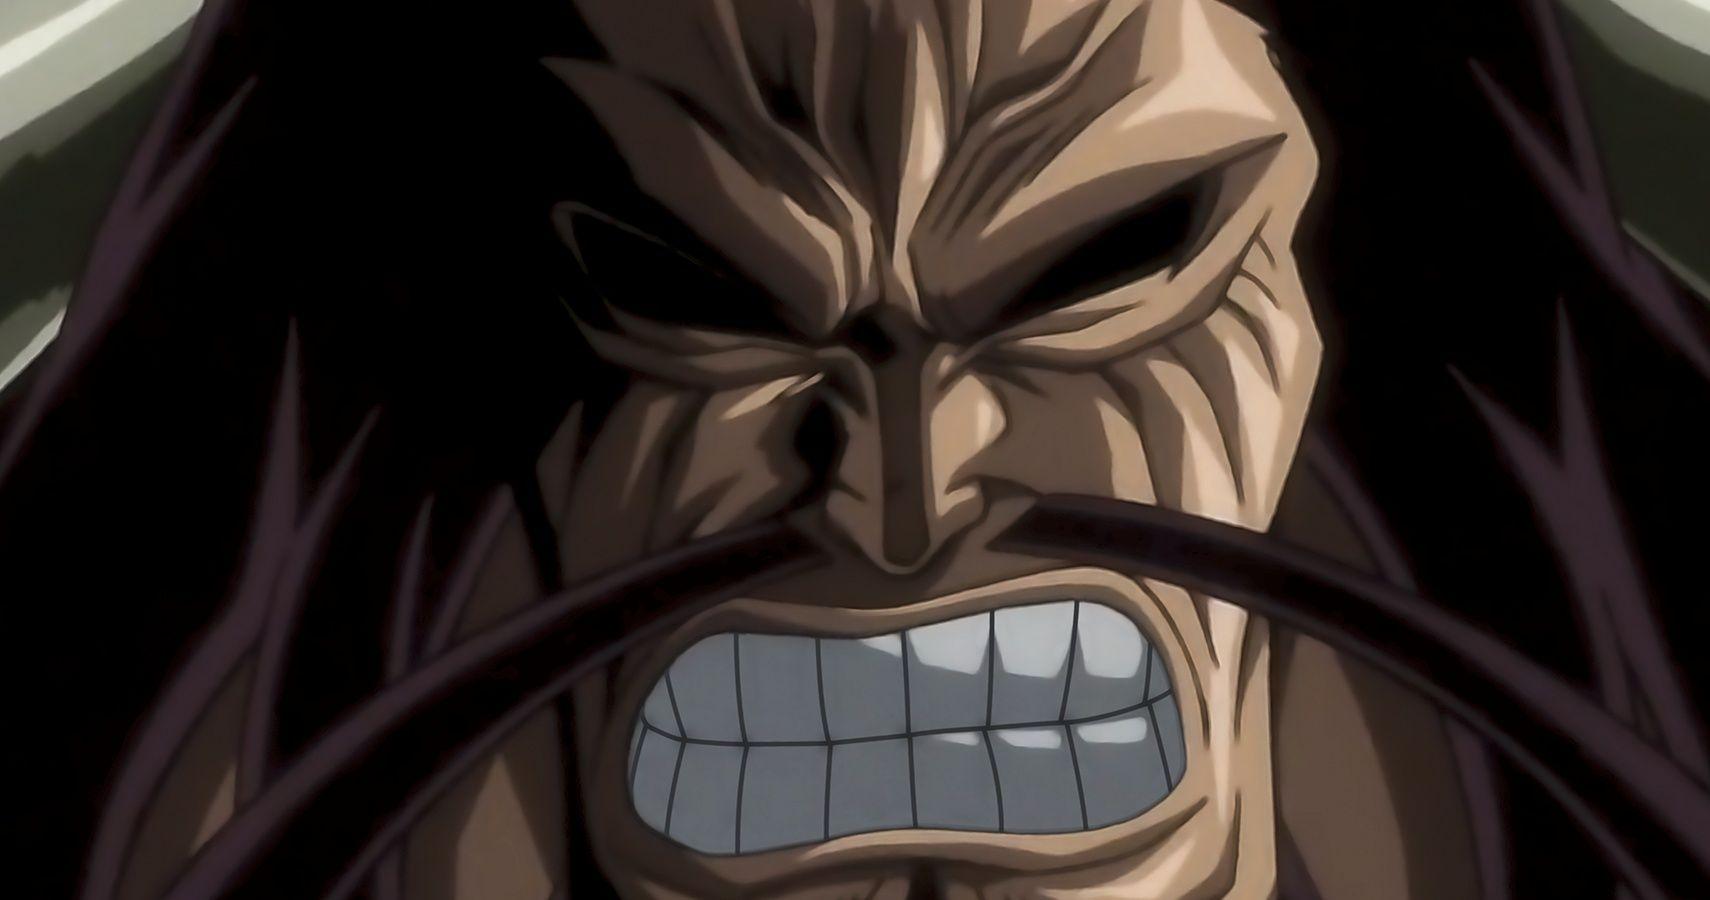 One Piece: Top 10 Villains Of The Yonko Saga - One Piece TV